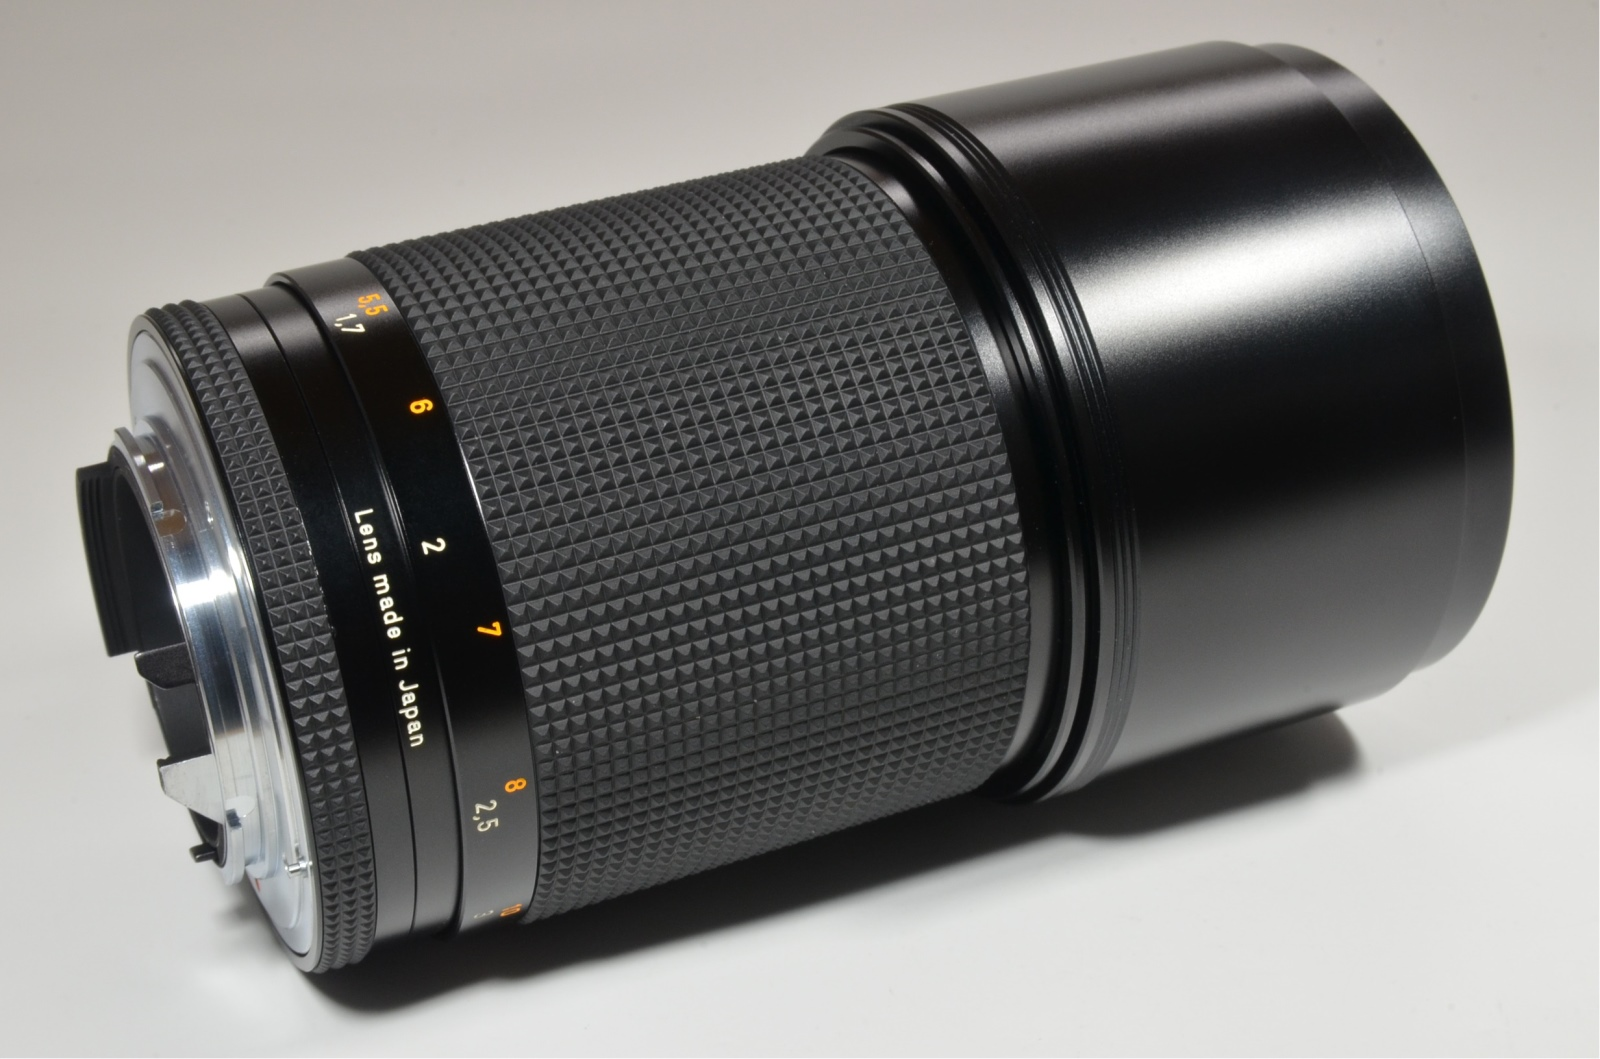 contax carl zeiss sonnar t* 180mm f2.8 mmj japan 'unused'